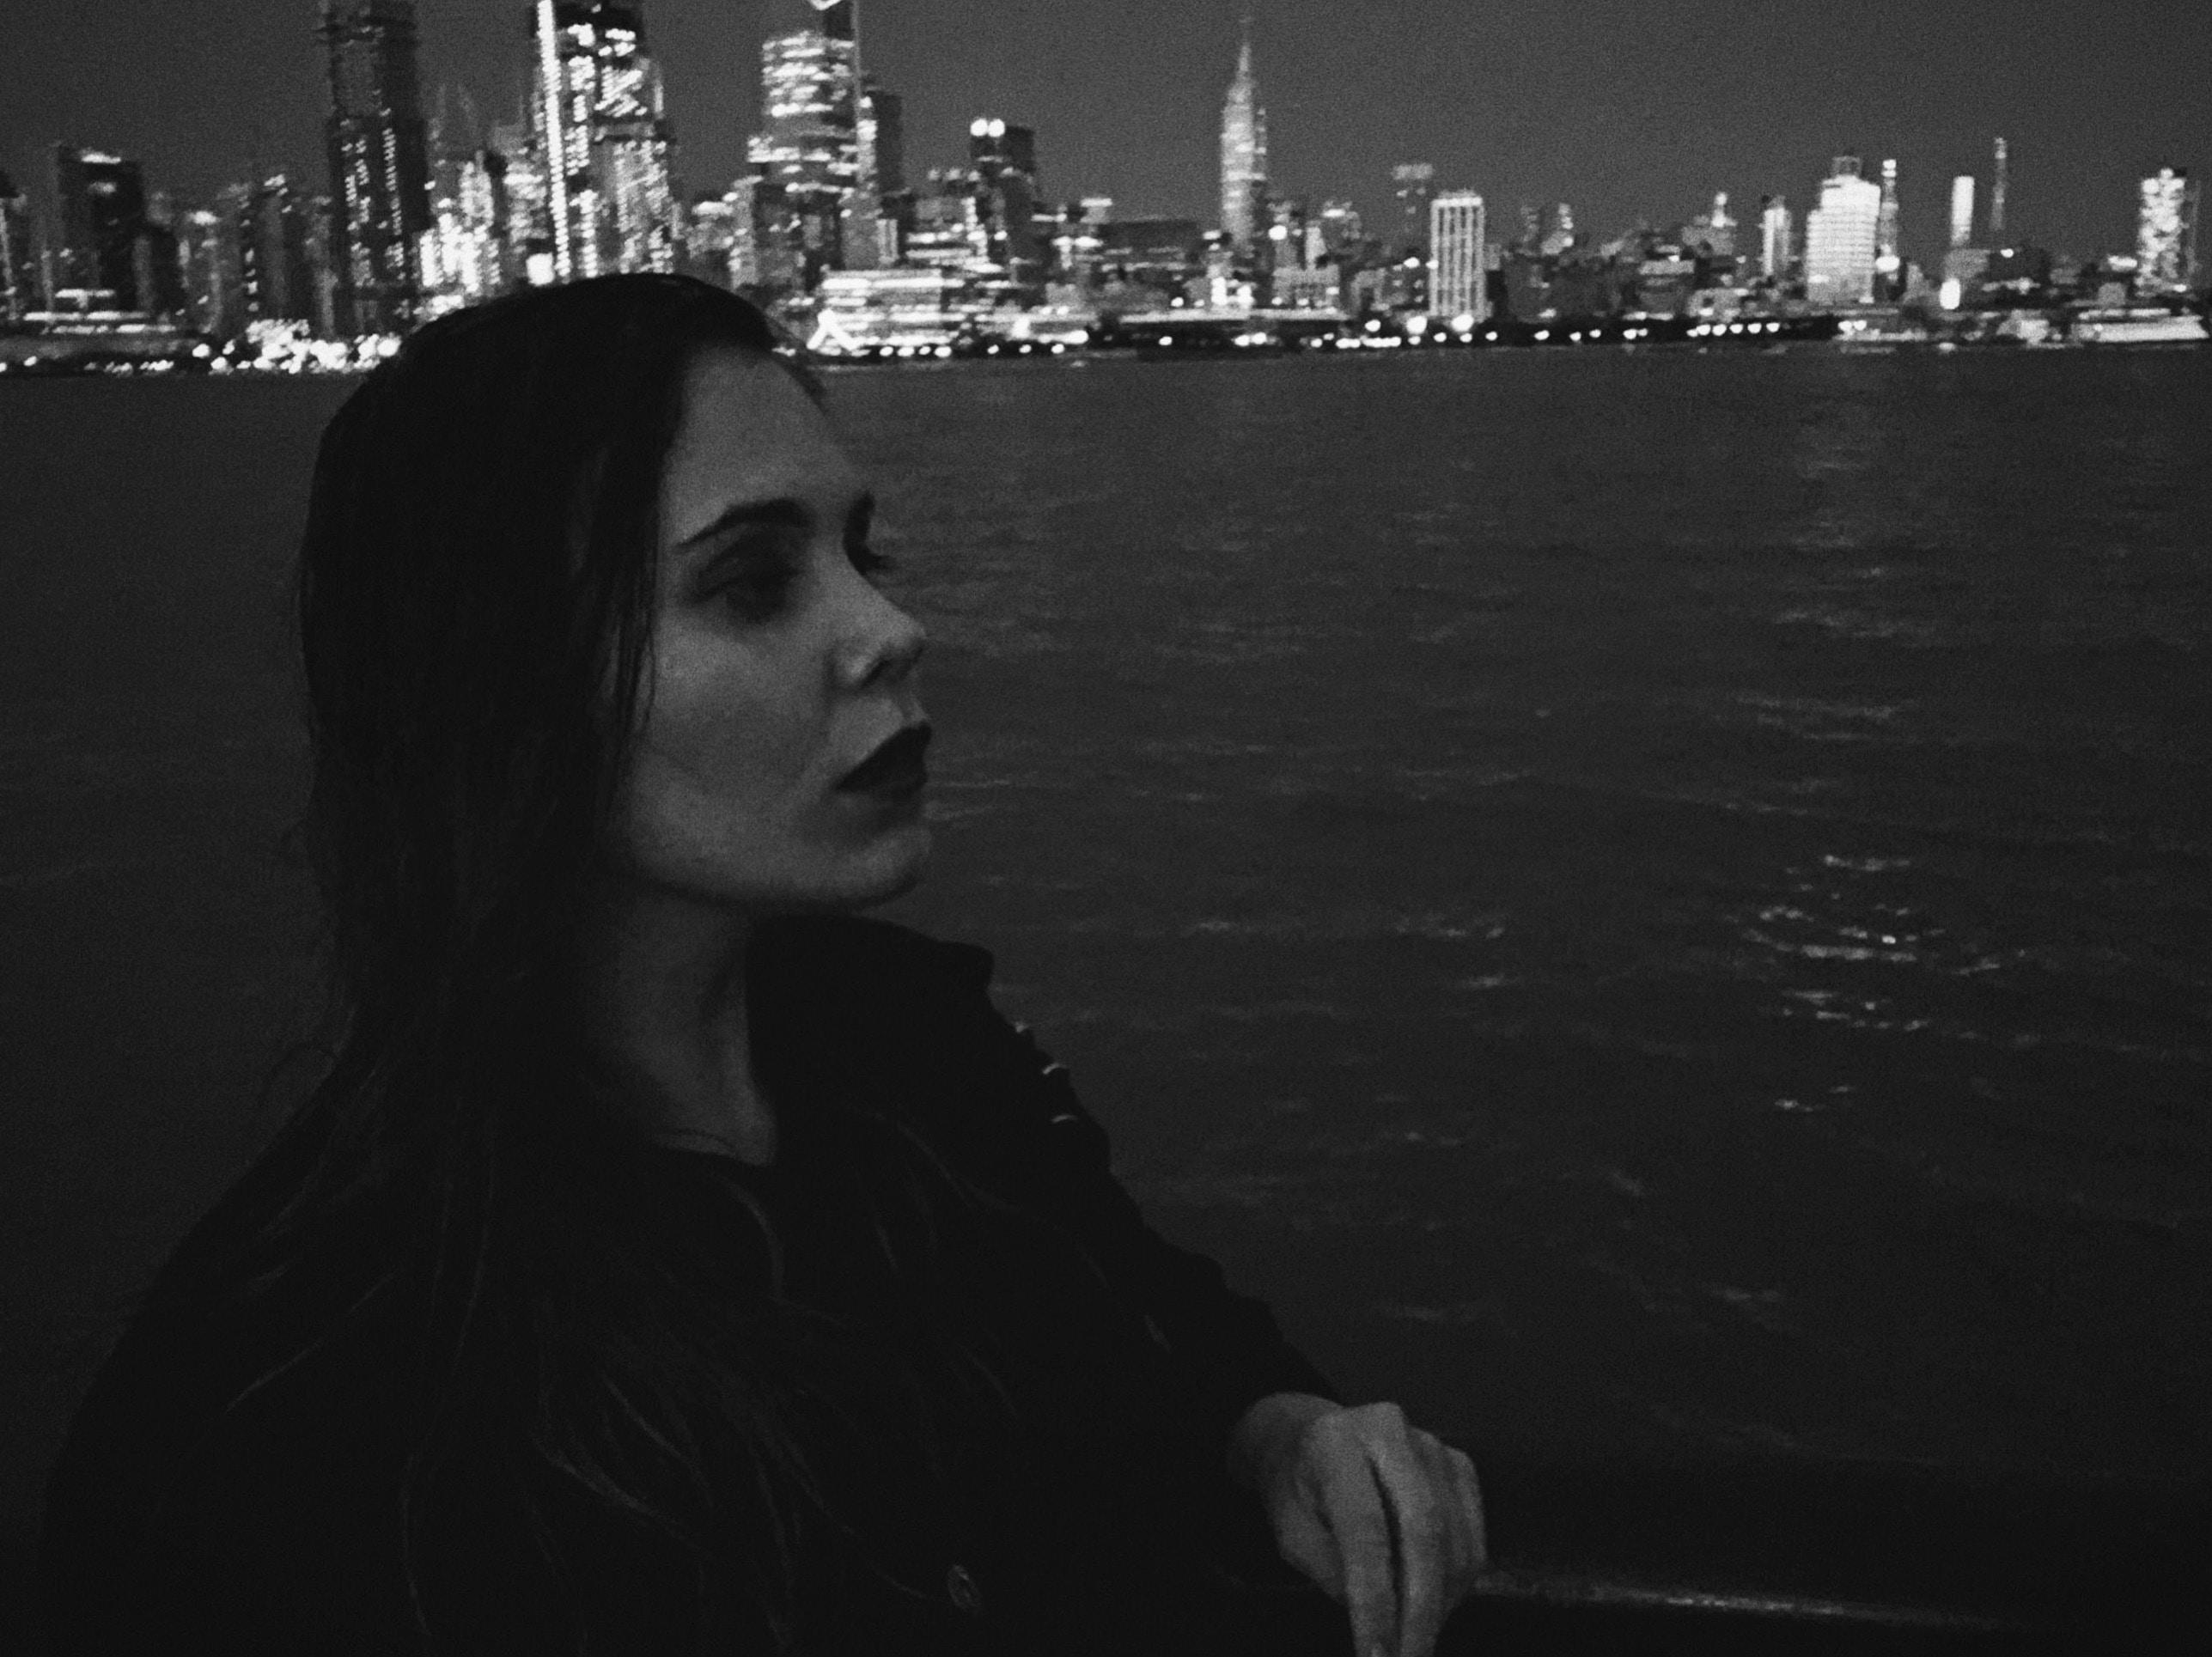 Go to Nina Perminova's profile